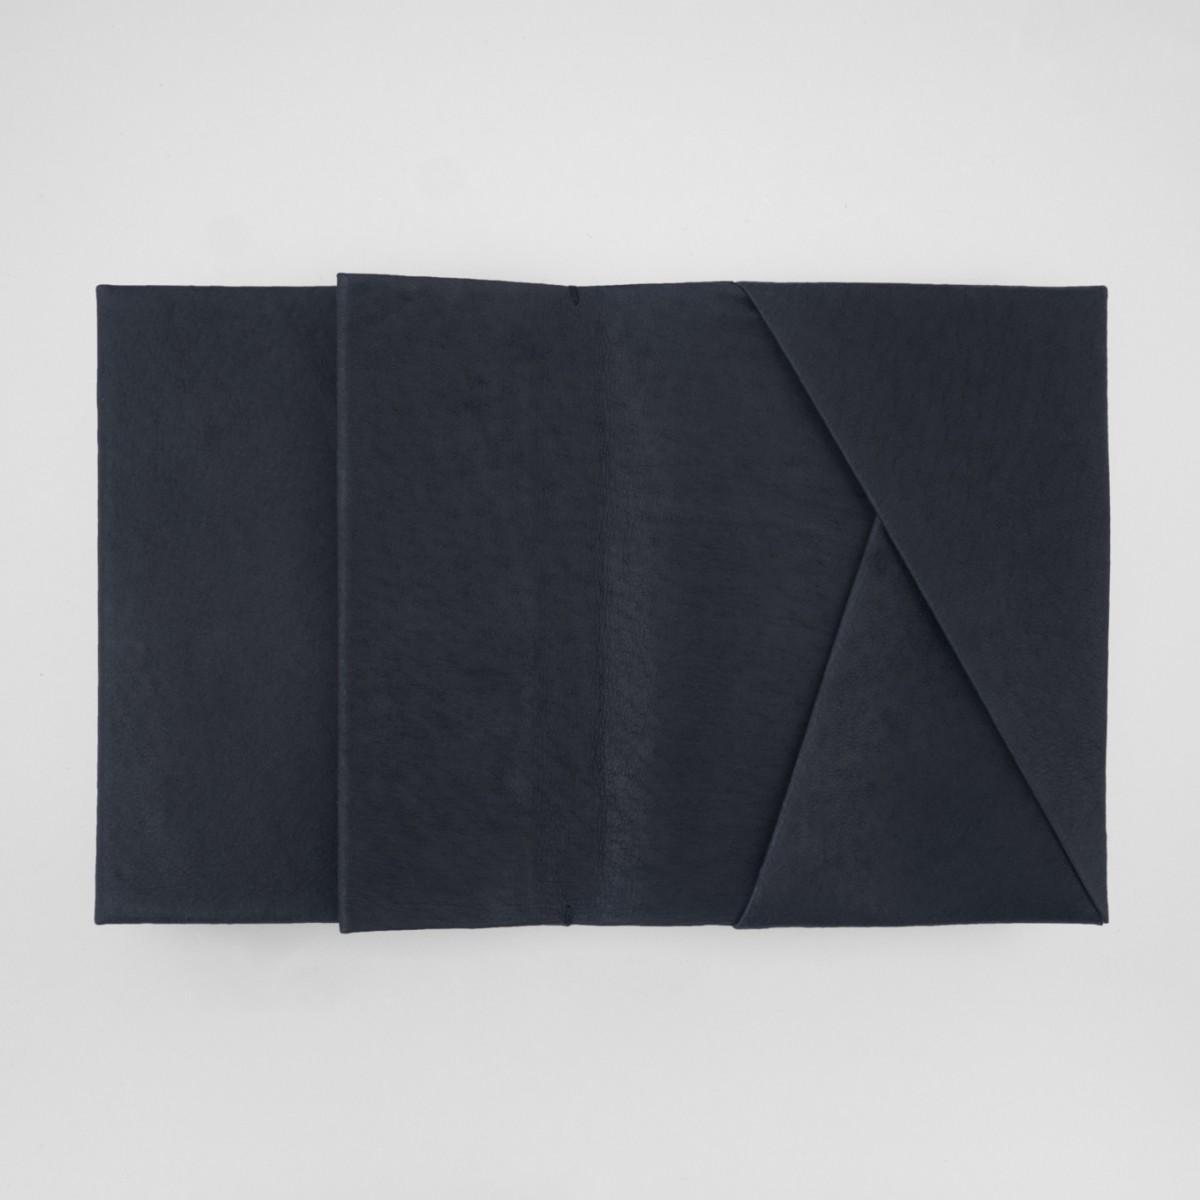 VANOOK Wallet Large / Charcoal